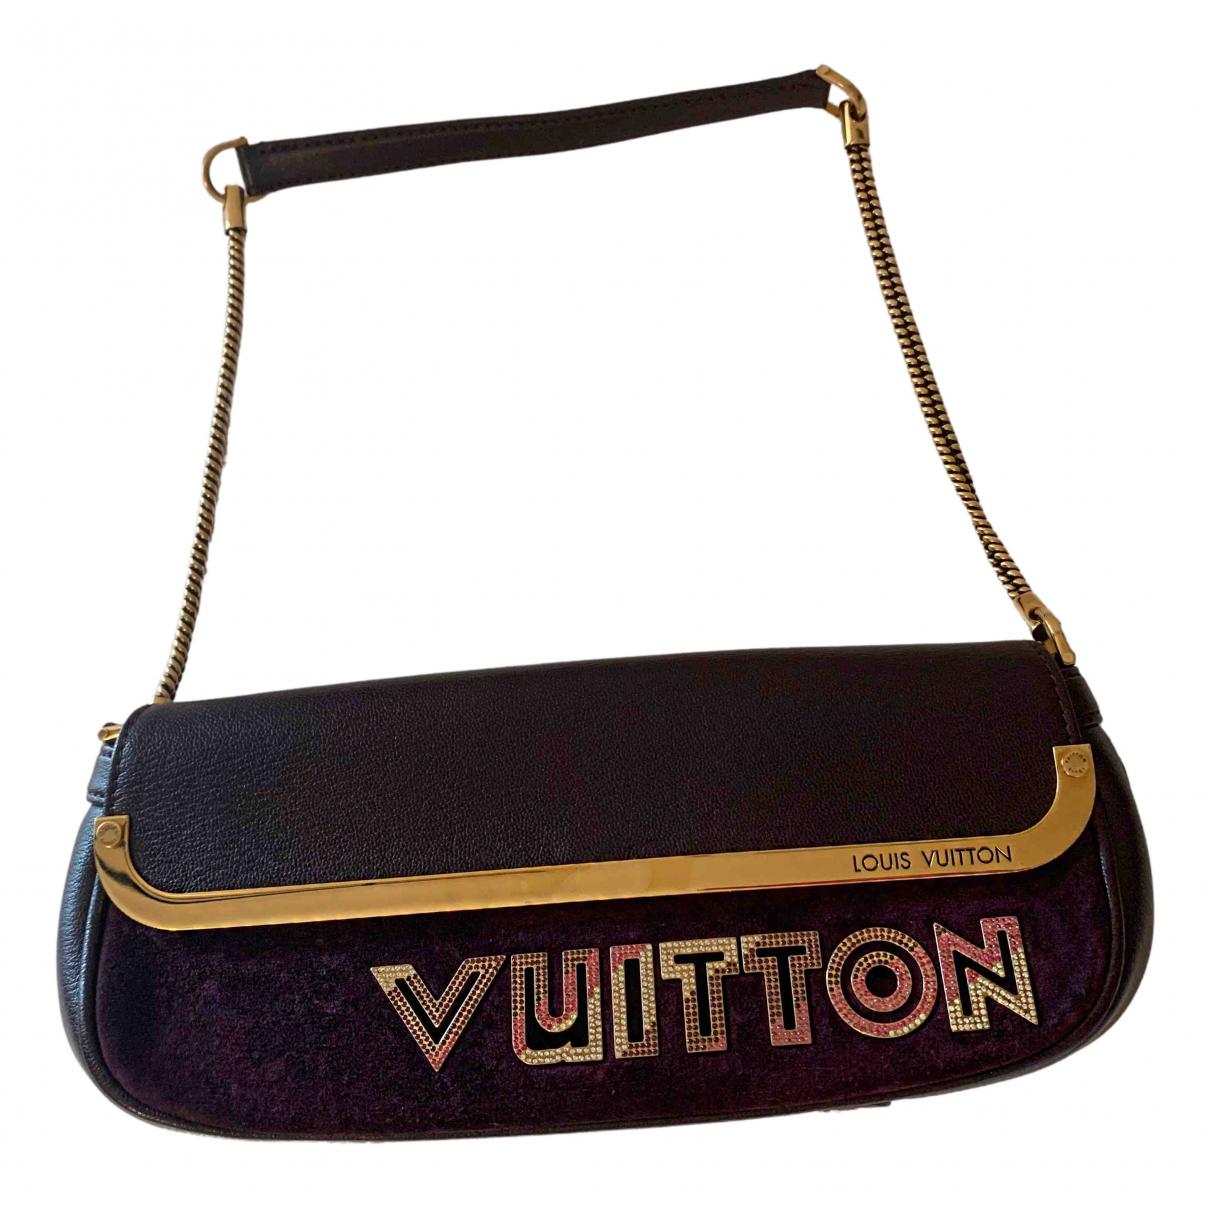 Louis Vuitton N Purple Suede Clutch bag for Women N